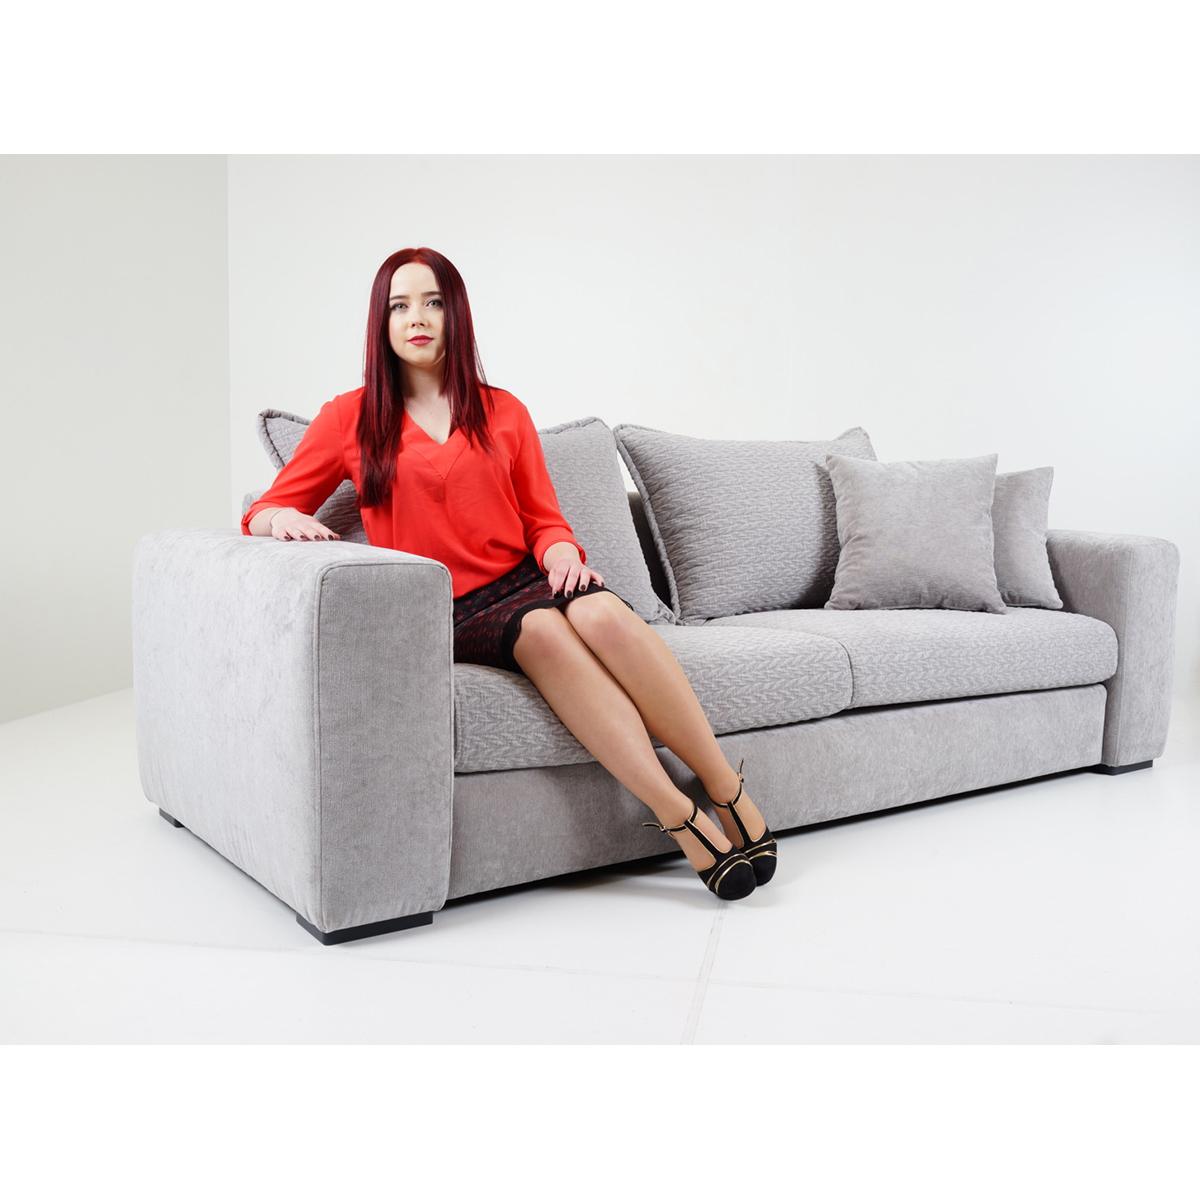 sofa venezia das designersofa mit stil nur bei moebel. Black Bedroom Furniture Sets. Home Design Ideas